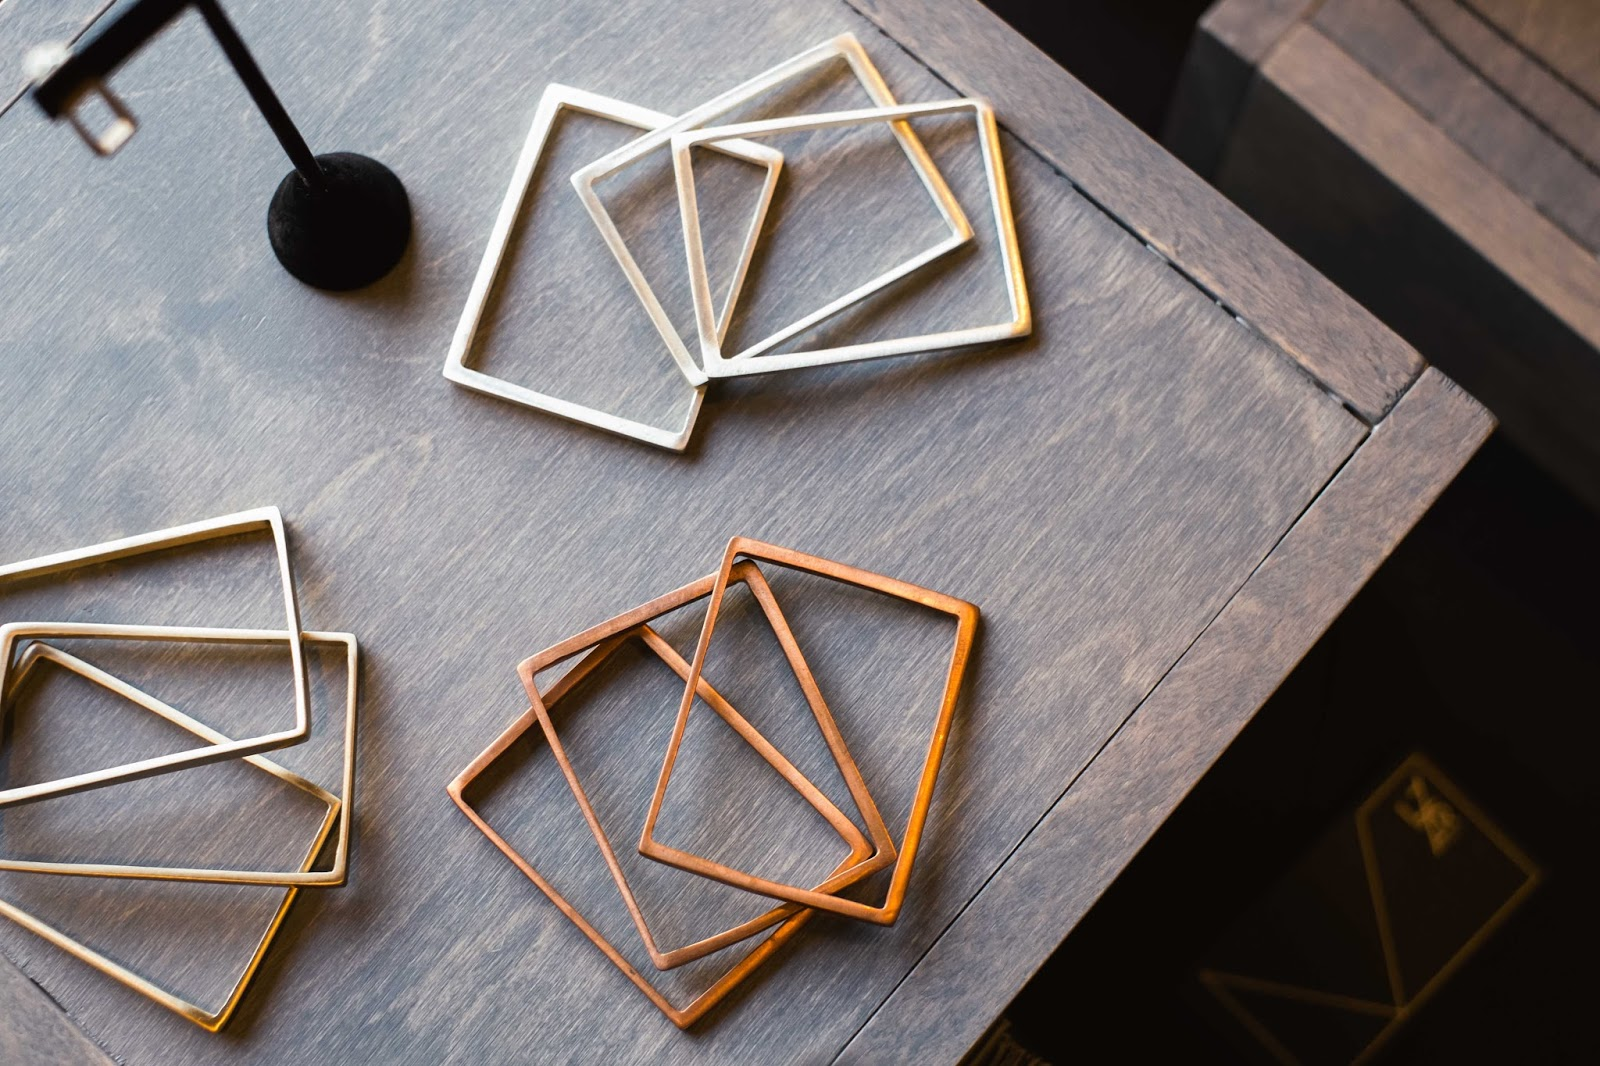 LZZR-%2Bmybelonging-lzzr-jewelry-losangeles-designer-dtla-acehotel-3.jpg